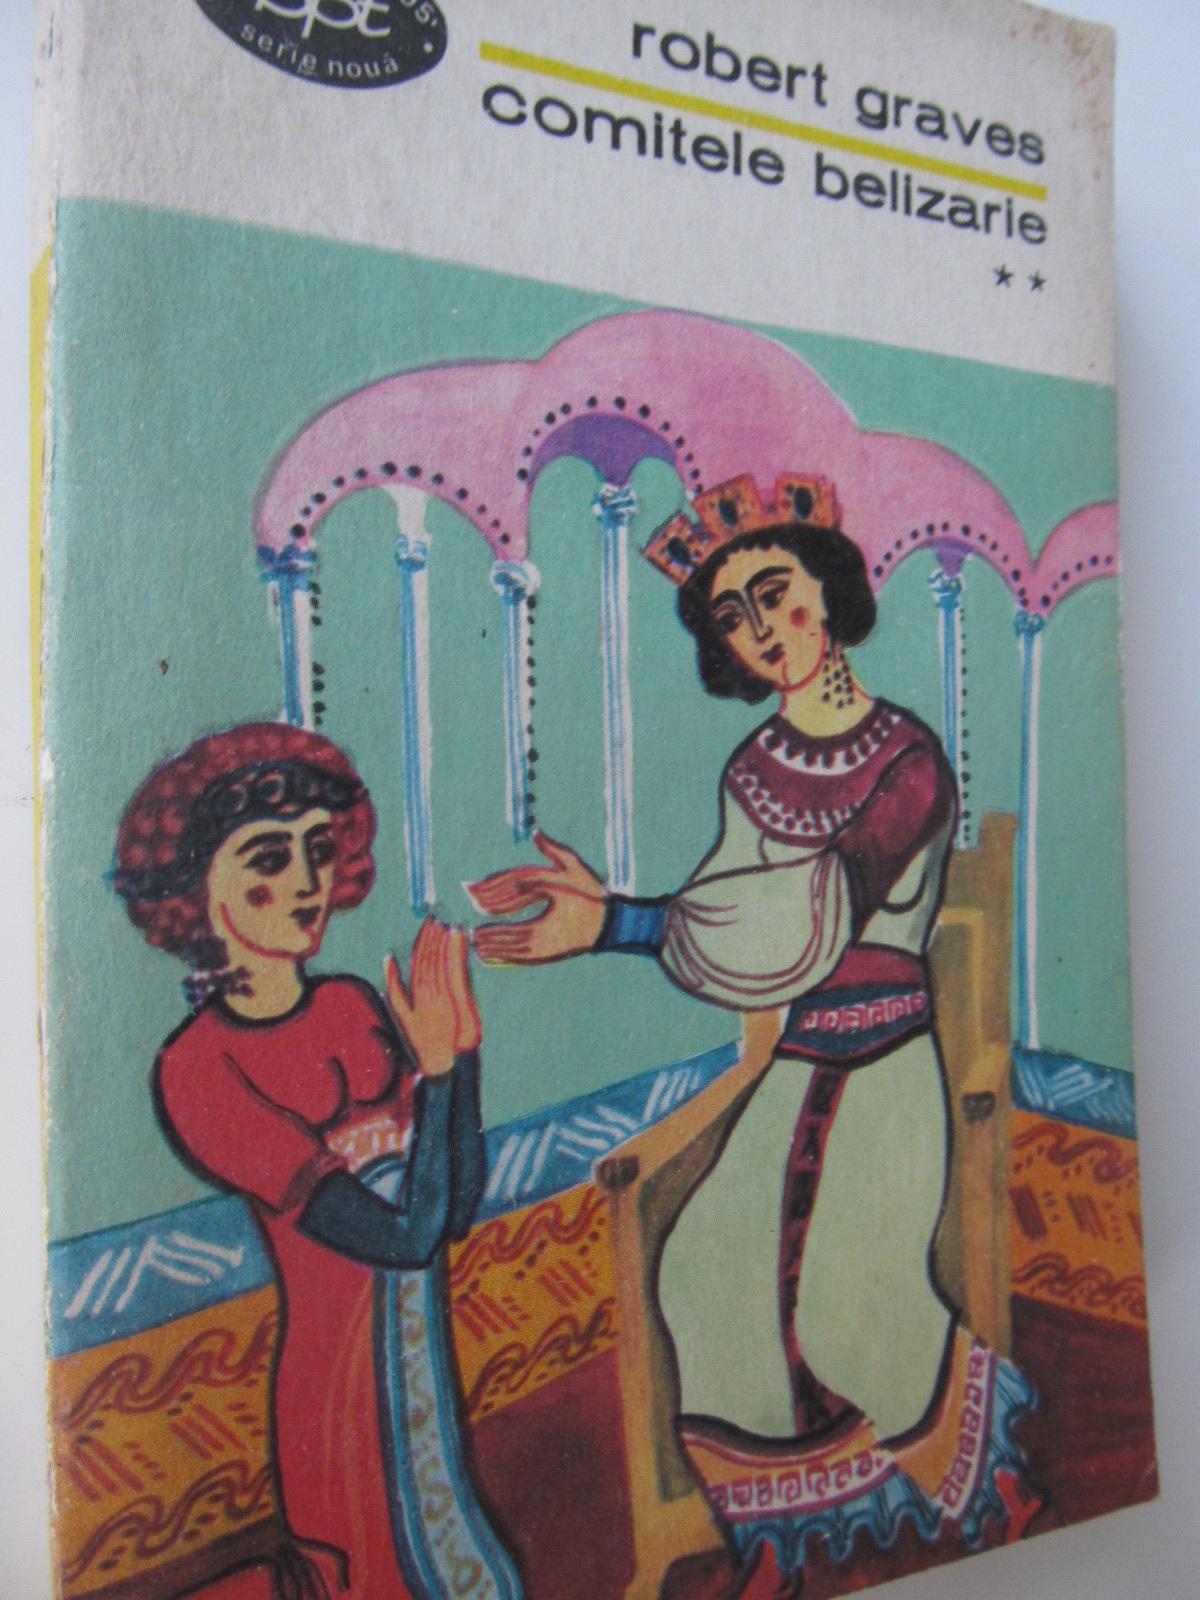 Comitele Belizarie (vol. 2) - Robert Graves | Detalii carte